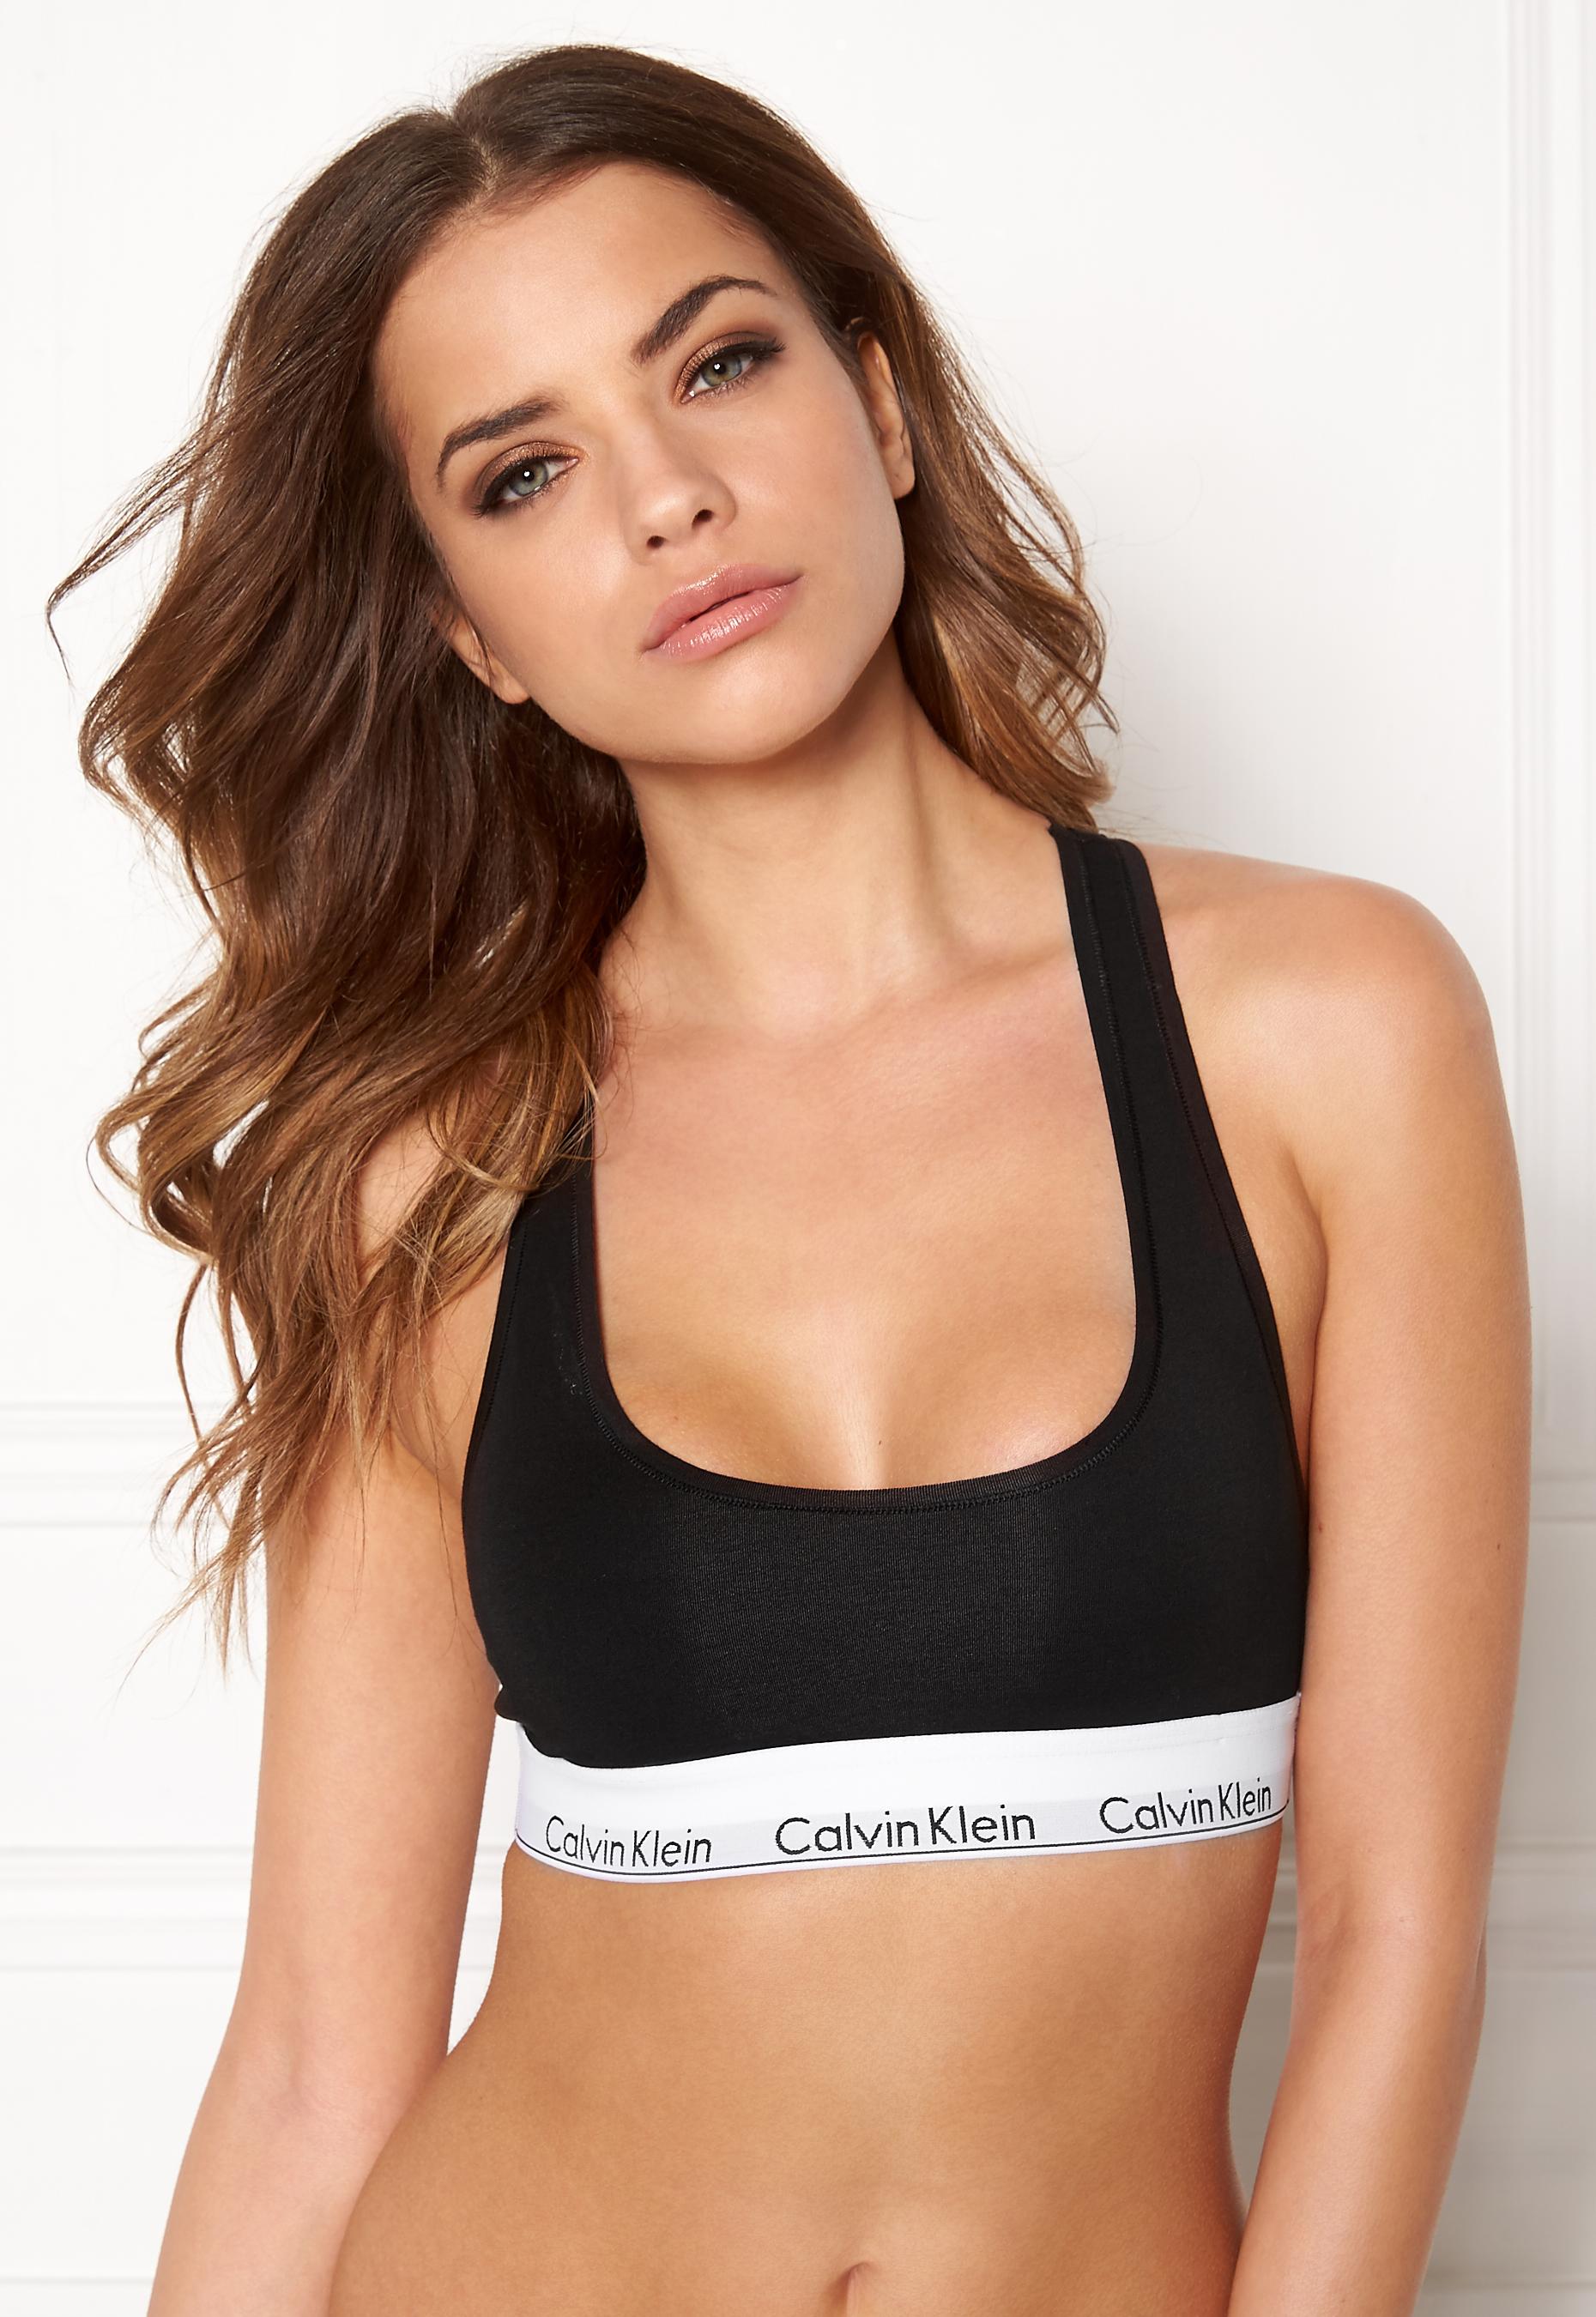 8074164f14 Calvin Klein CK Cotton Bralette 001 Black - Bubbleroom